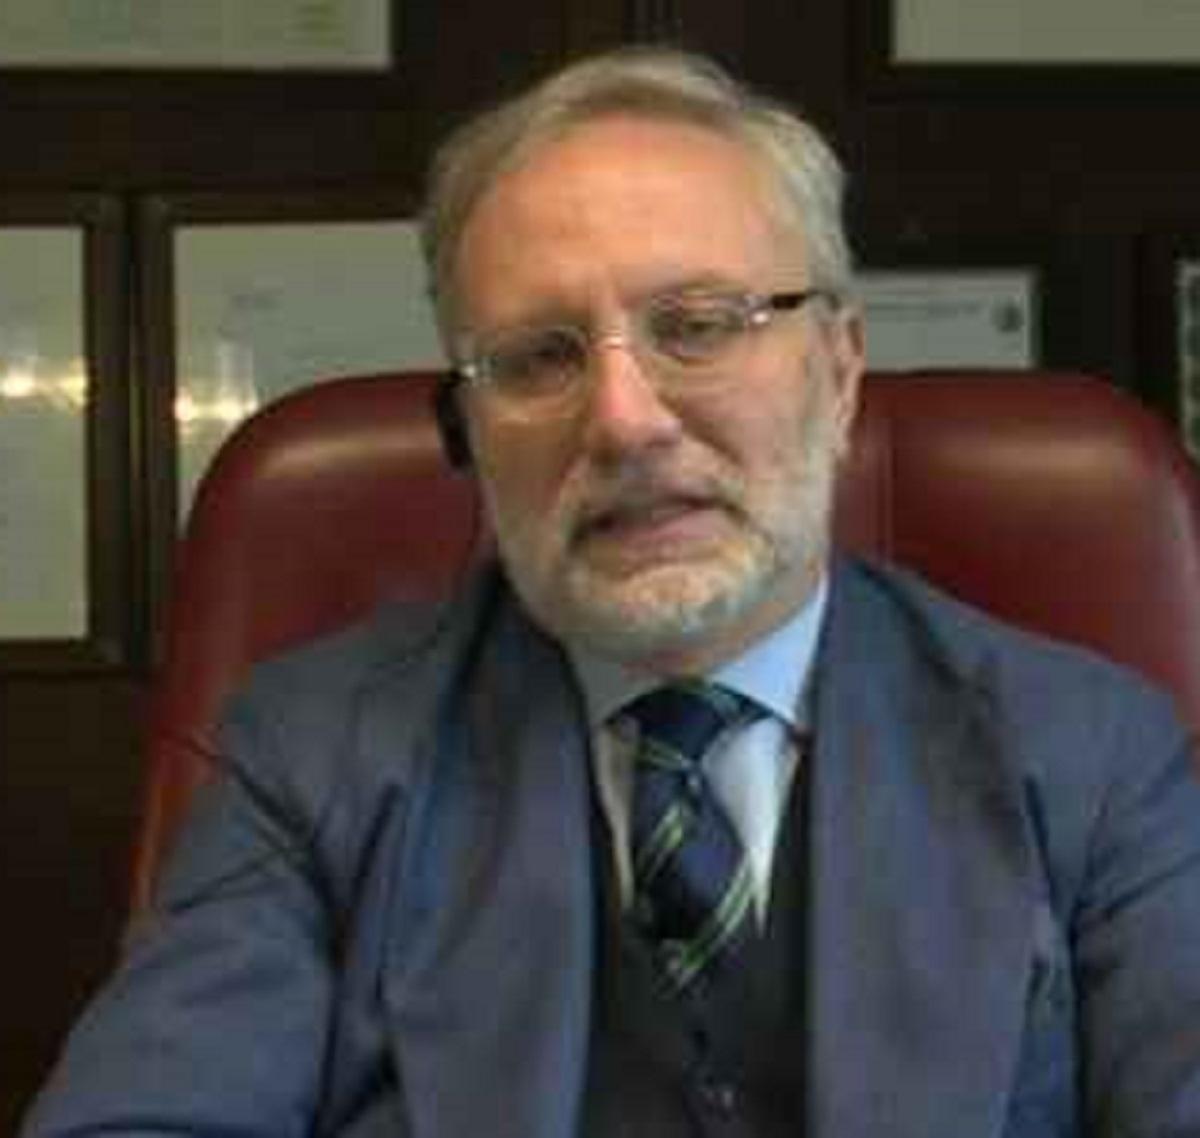 Denise Pipitone scomparsa ipotesi avvocato Giacomo Frazzitta pista ricerche